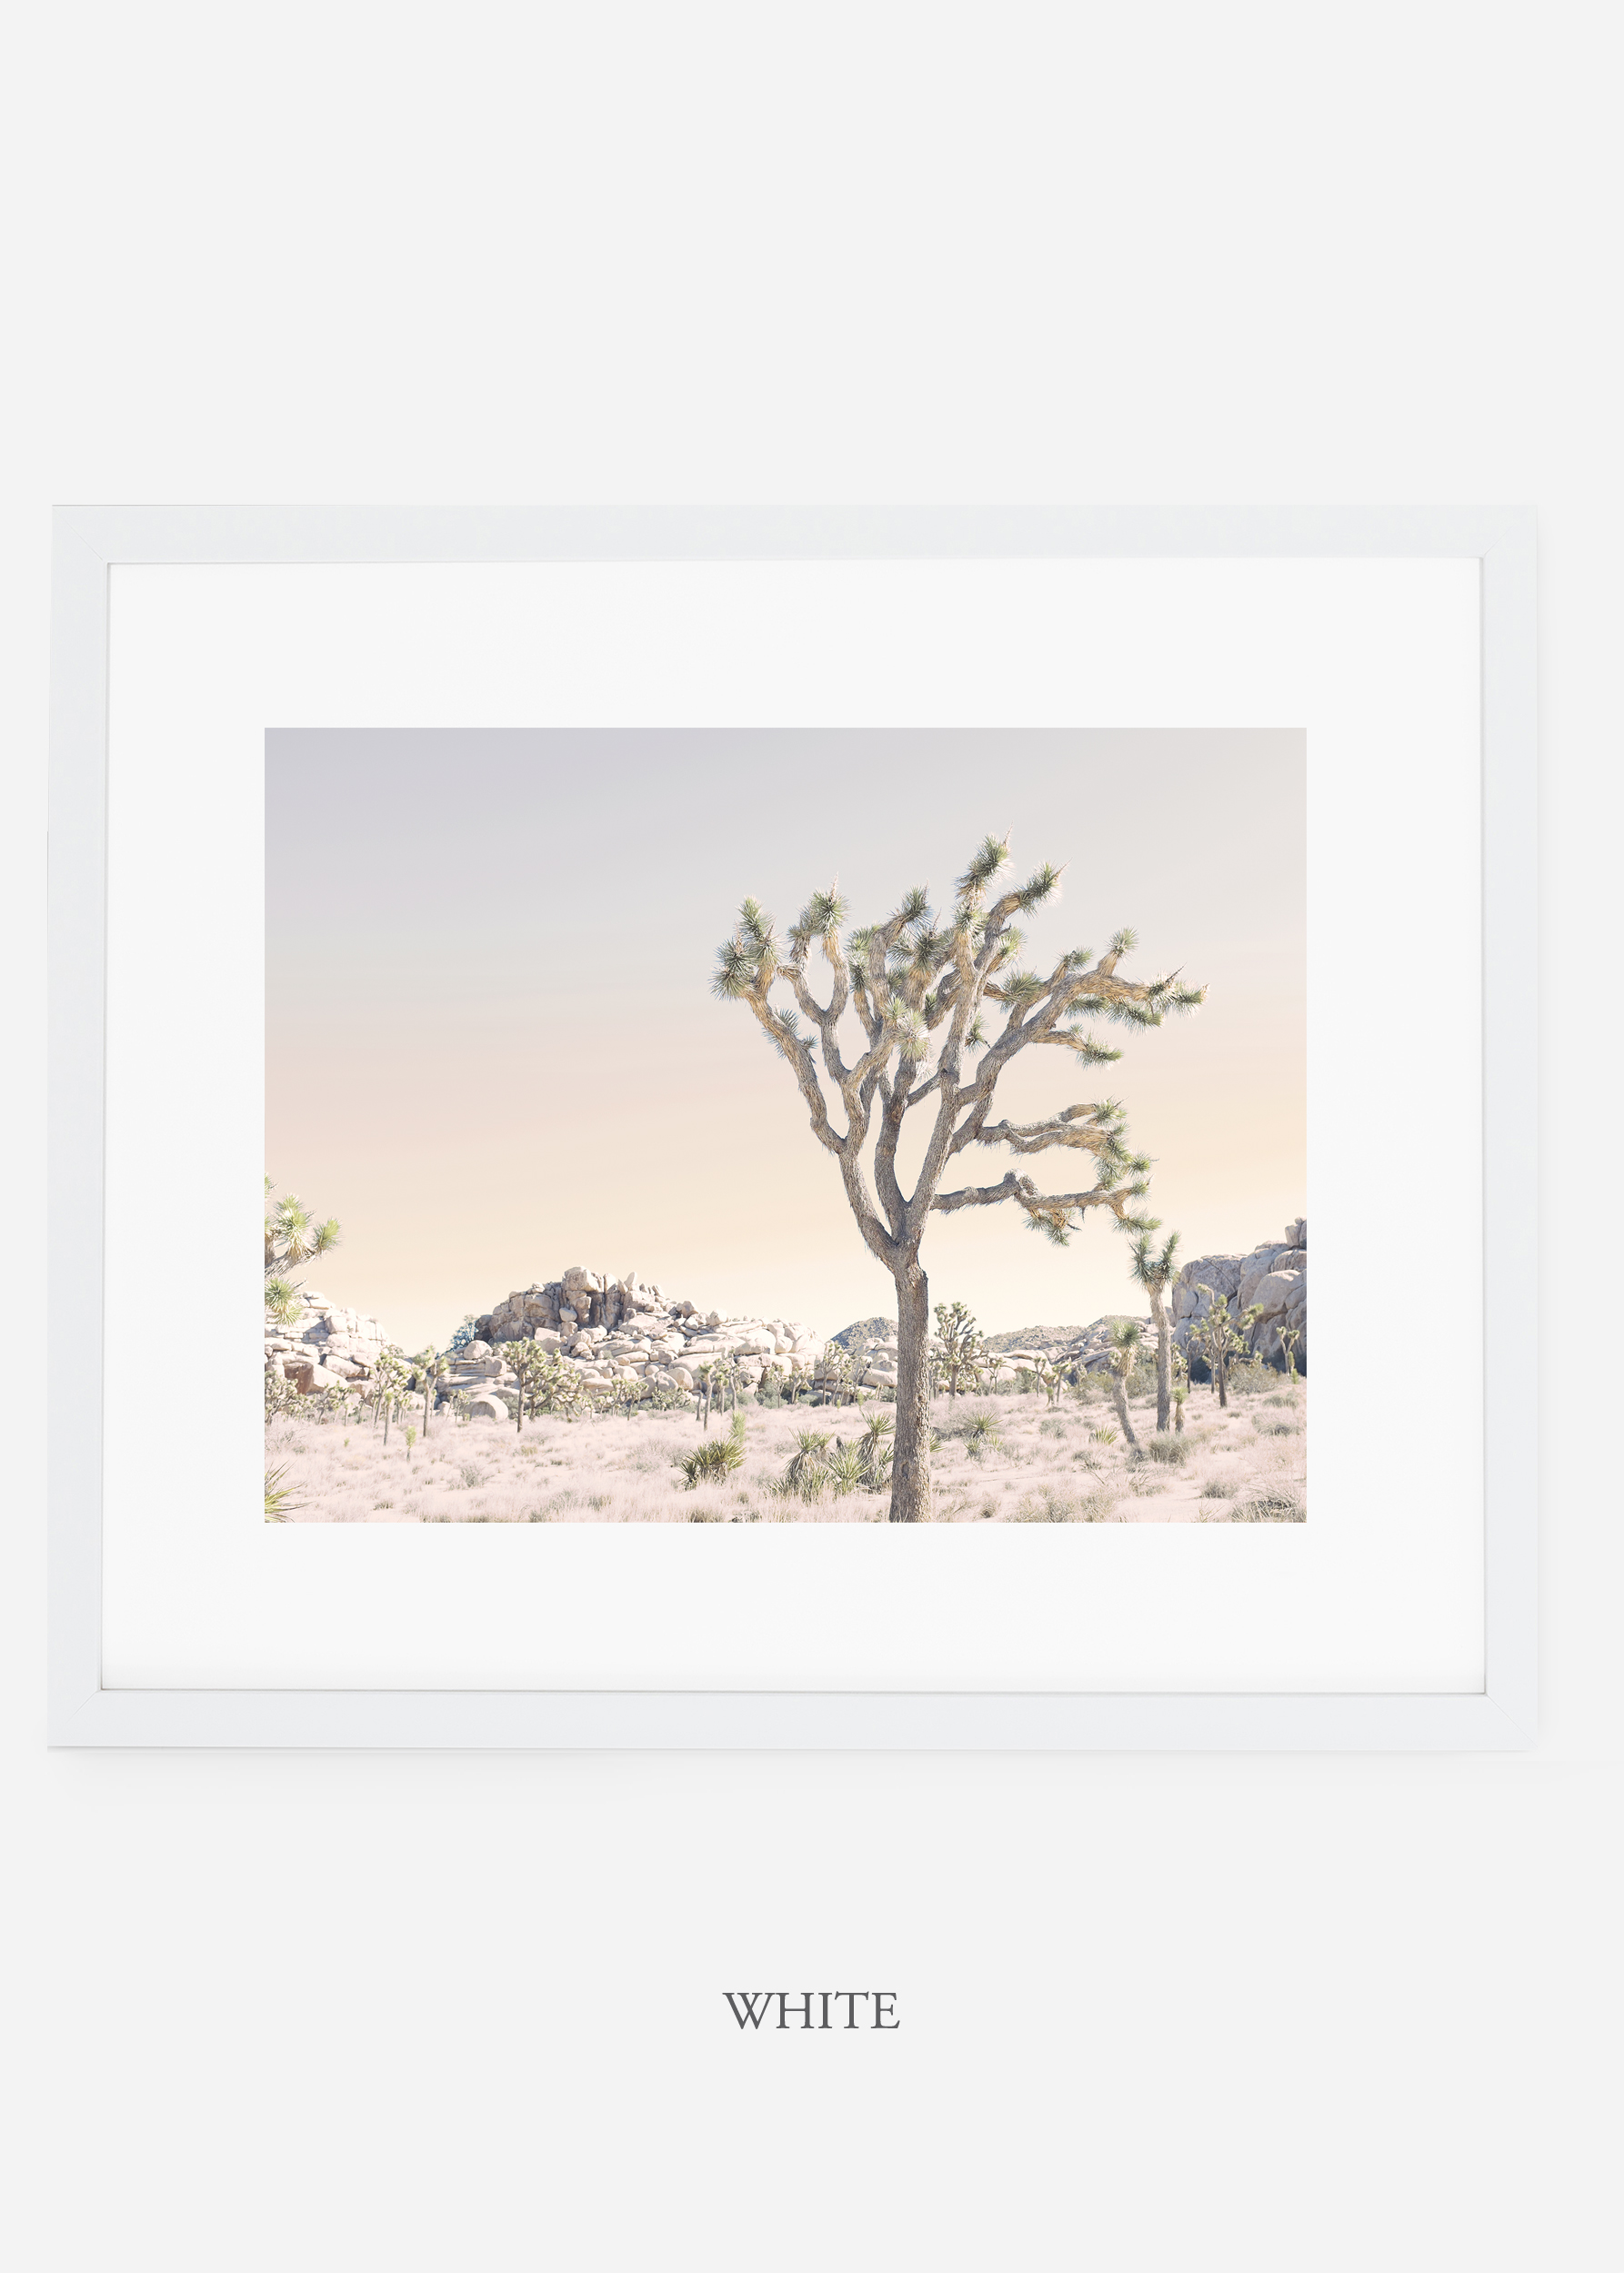 WilderCalifornia_whiteframe_JoshuaTree_No.3_interiordesign_prints_art.jpg